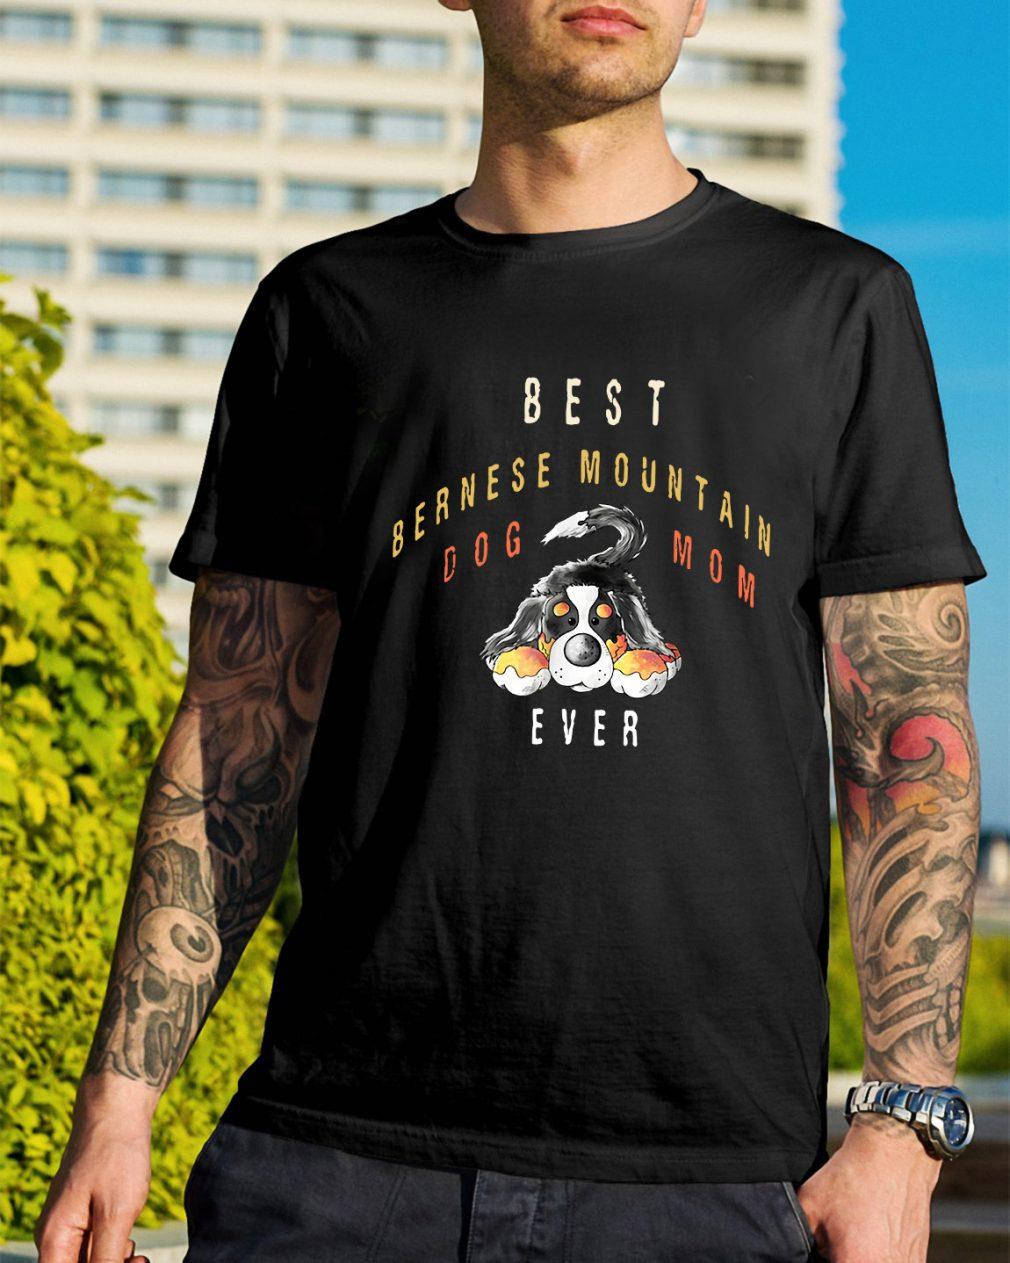 Best Bernese mountain dog mom ever shirt